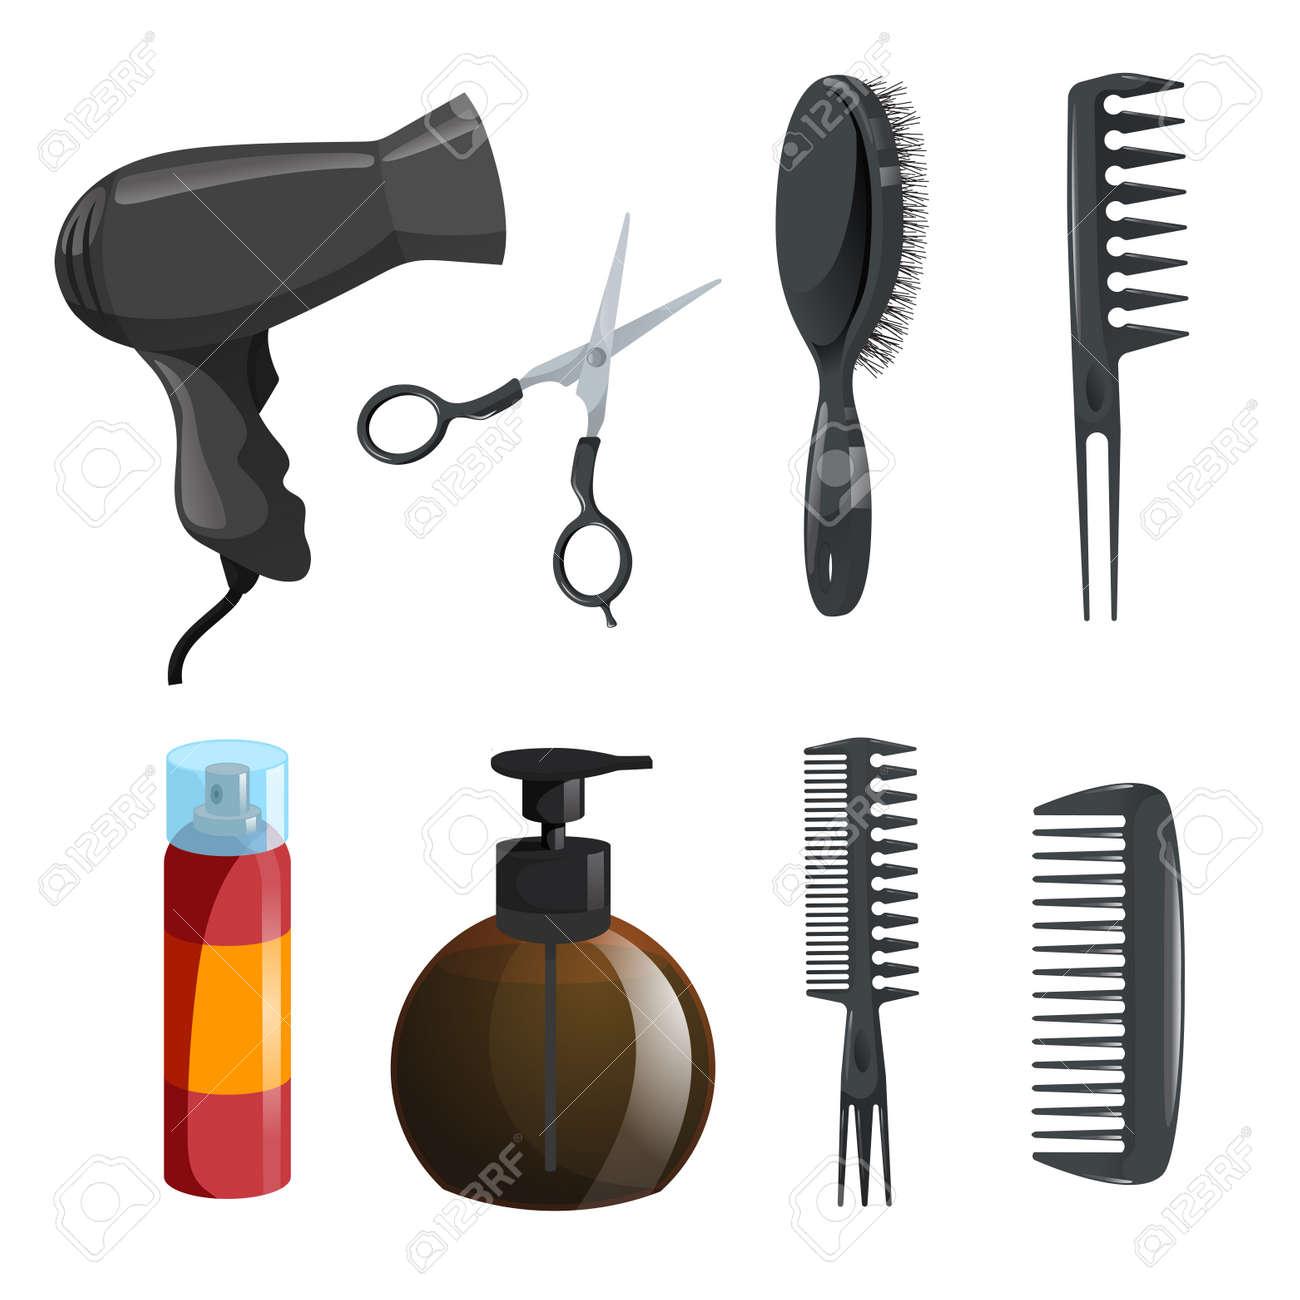 ecb632bbeb5 Hair beauty salon equipment set. Stock Vector - 91948948